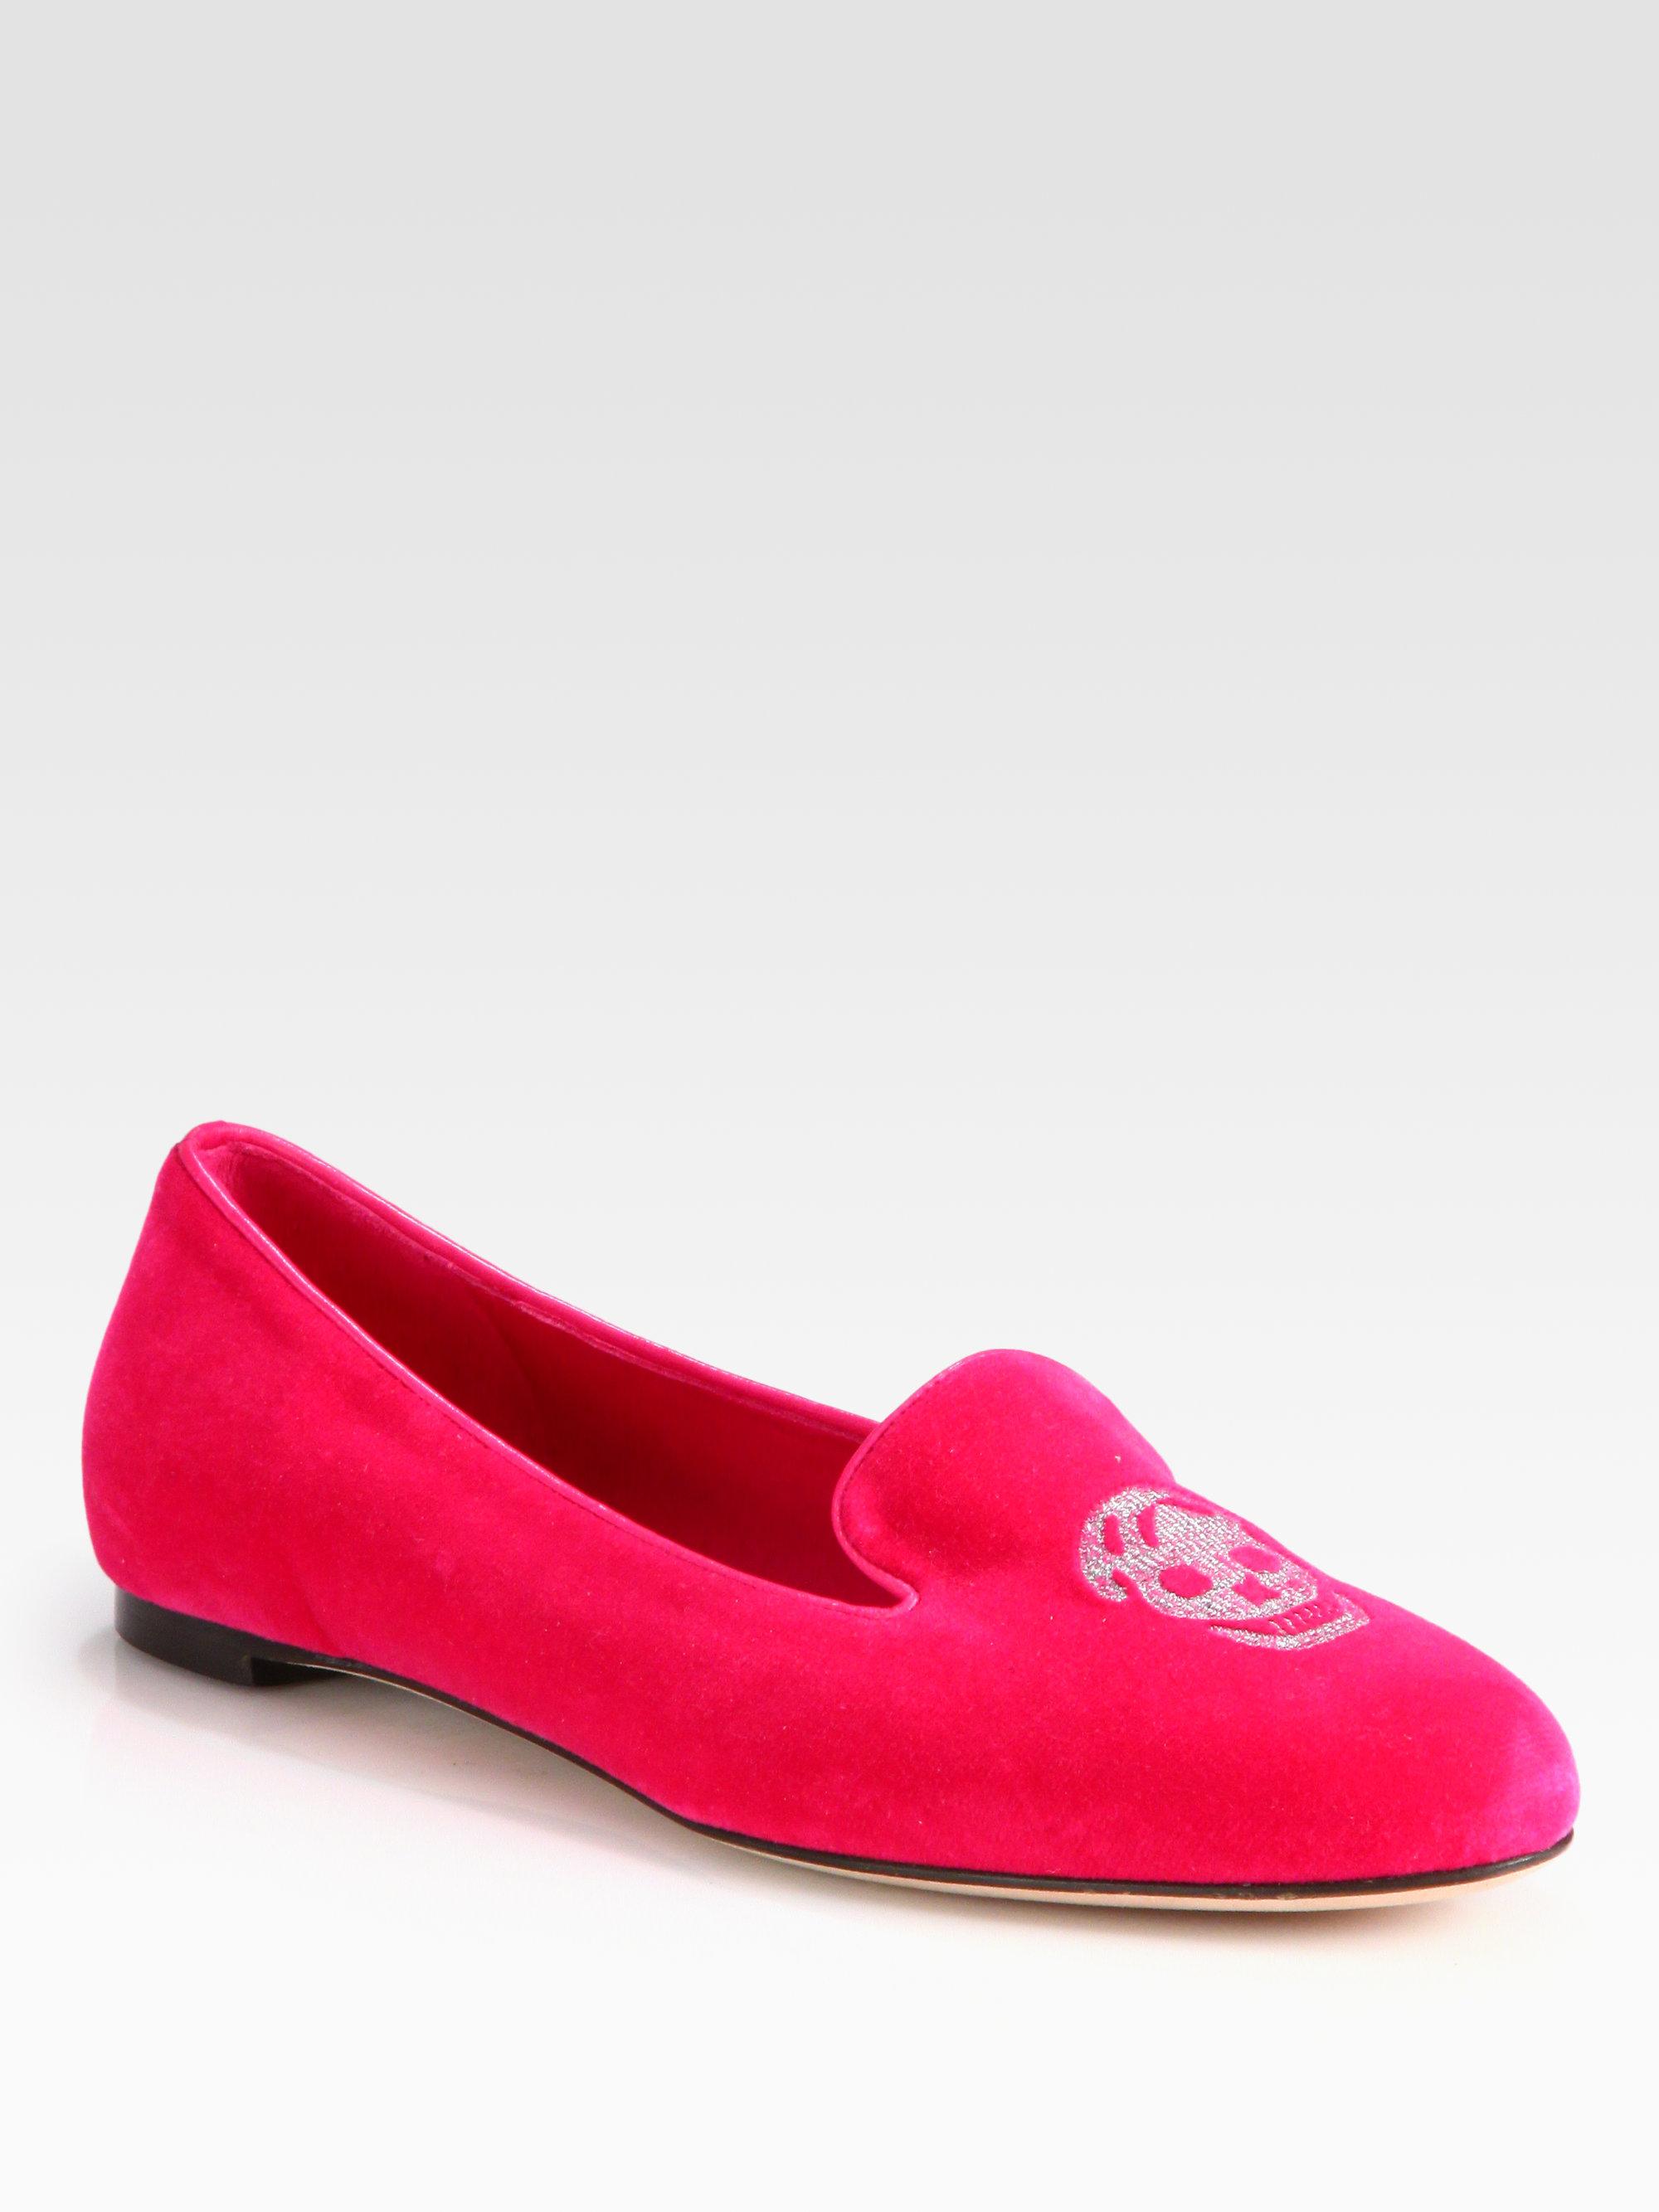 1658bd98f7747 Shoeniverse: ALEXANDER MCQUEEN Pink Velvet Skull Smoking Slippers